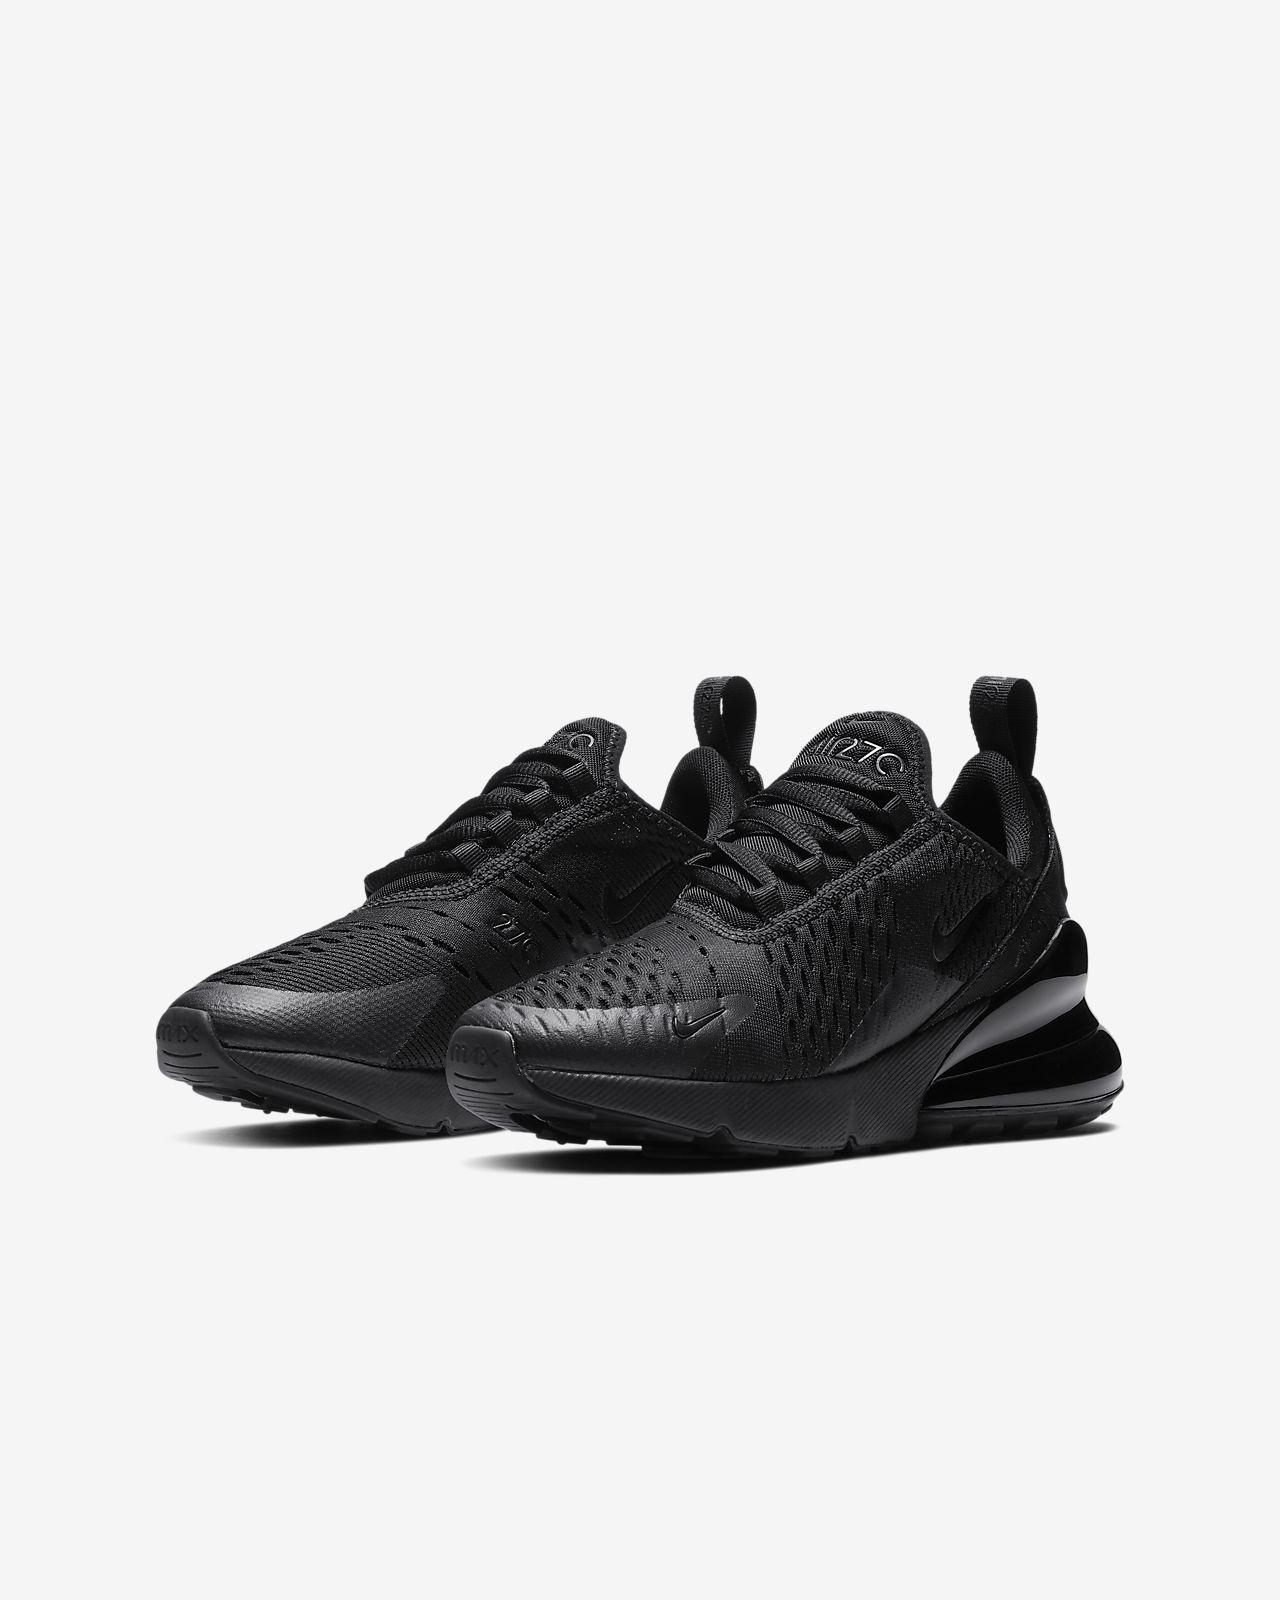 new arrival 668ca 8f558 Nike Air Max 270-sko til store børn